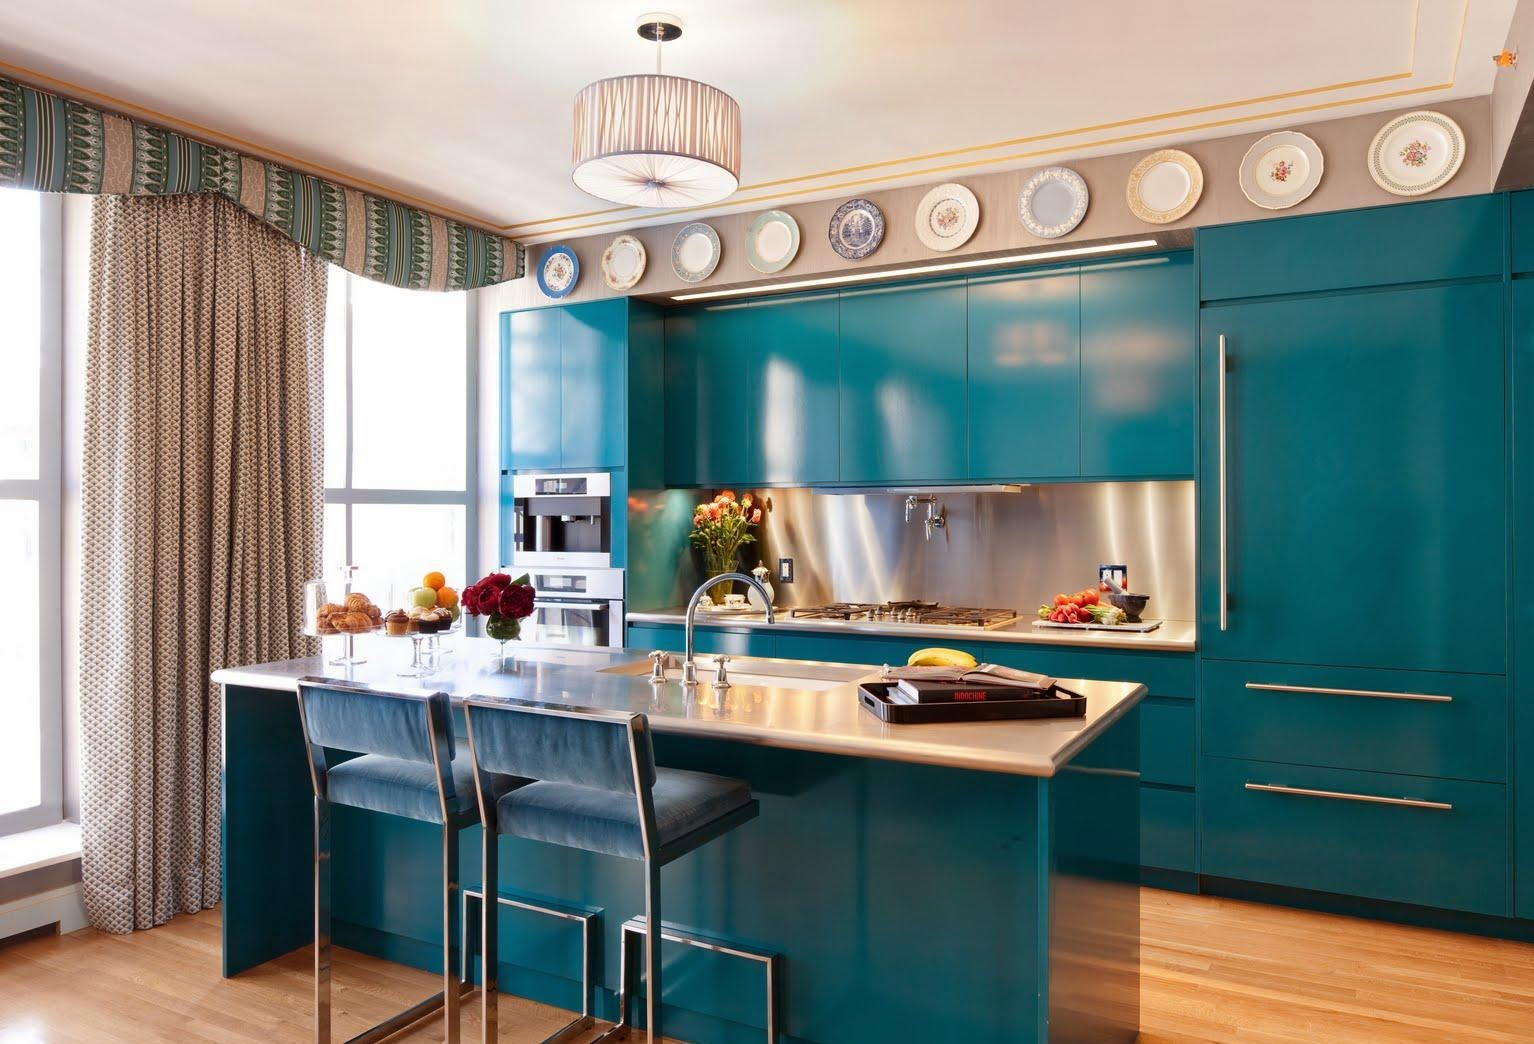 Rumah Minimalis Contoh Desain Dapur Minimalis Modern